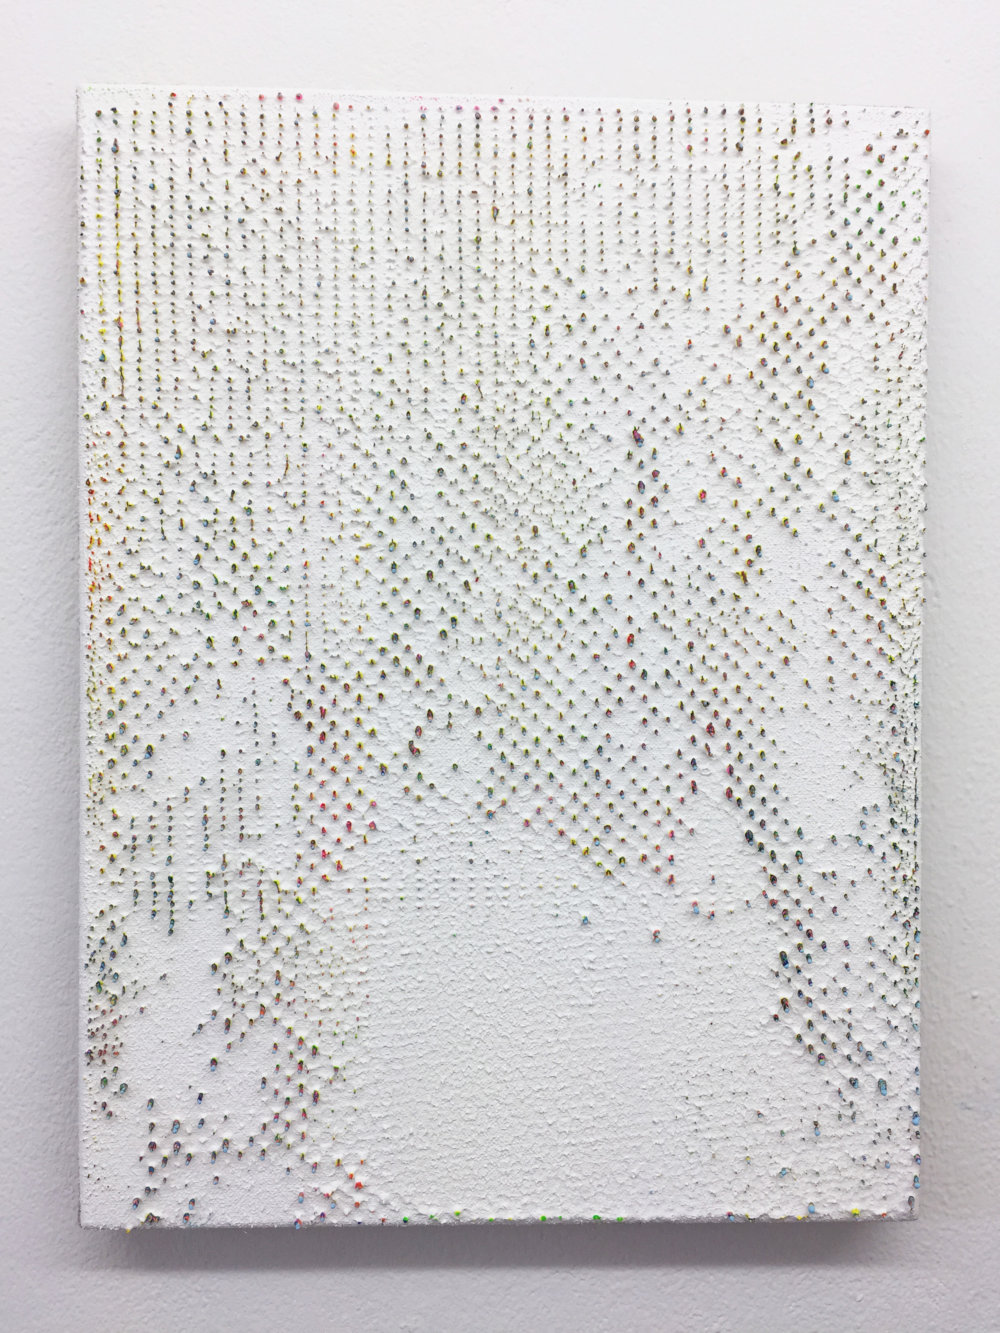 holzwege 2, 40 x 30 cm, acryl op doek 2018